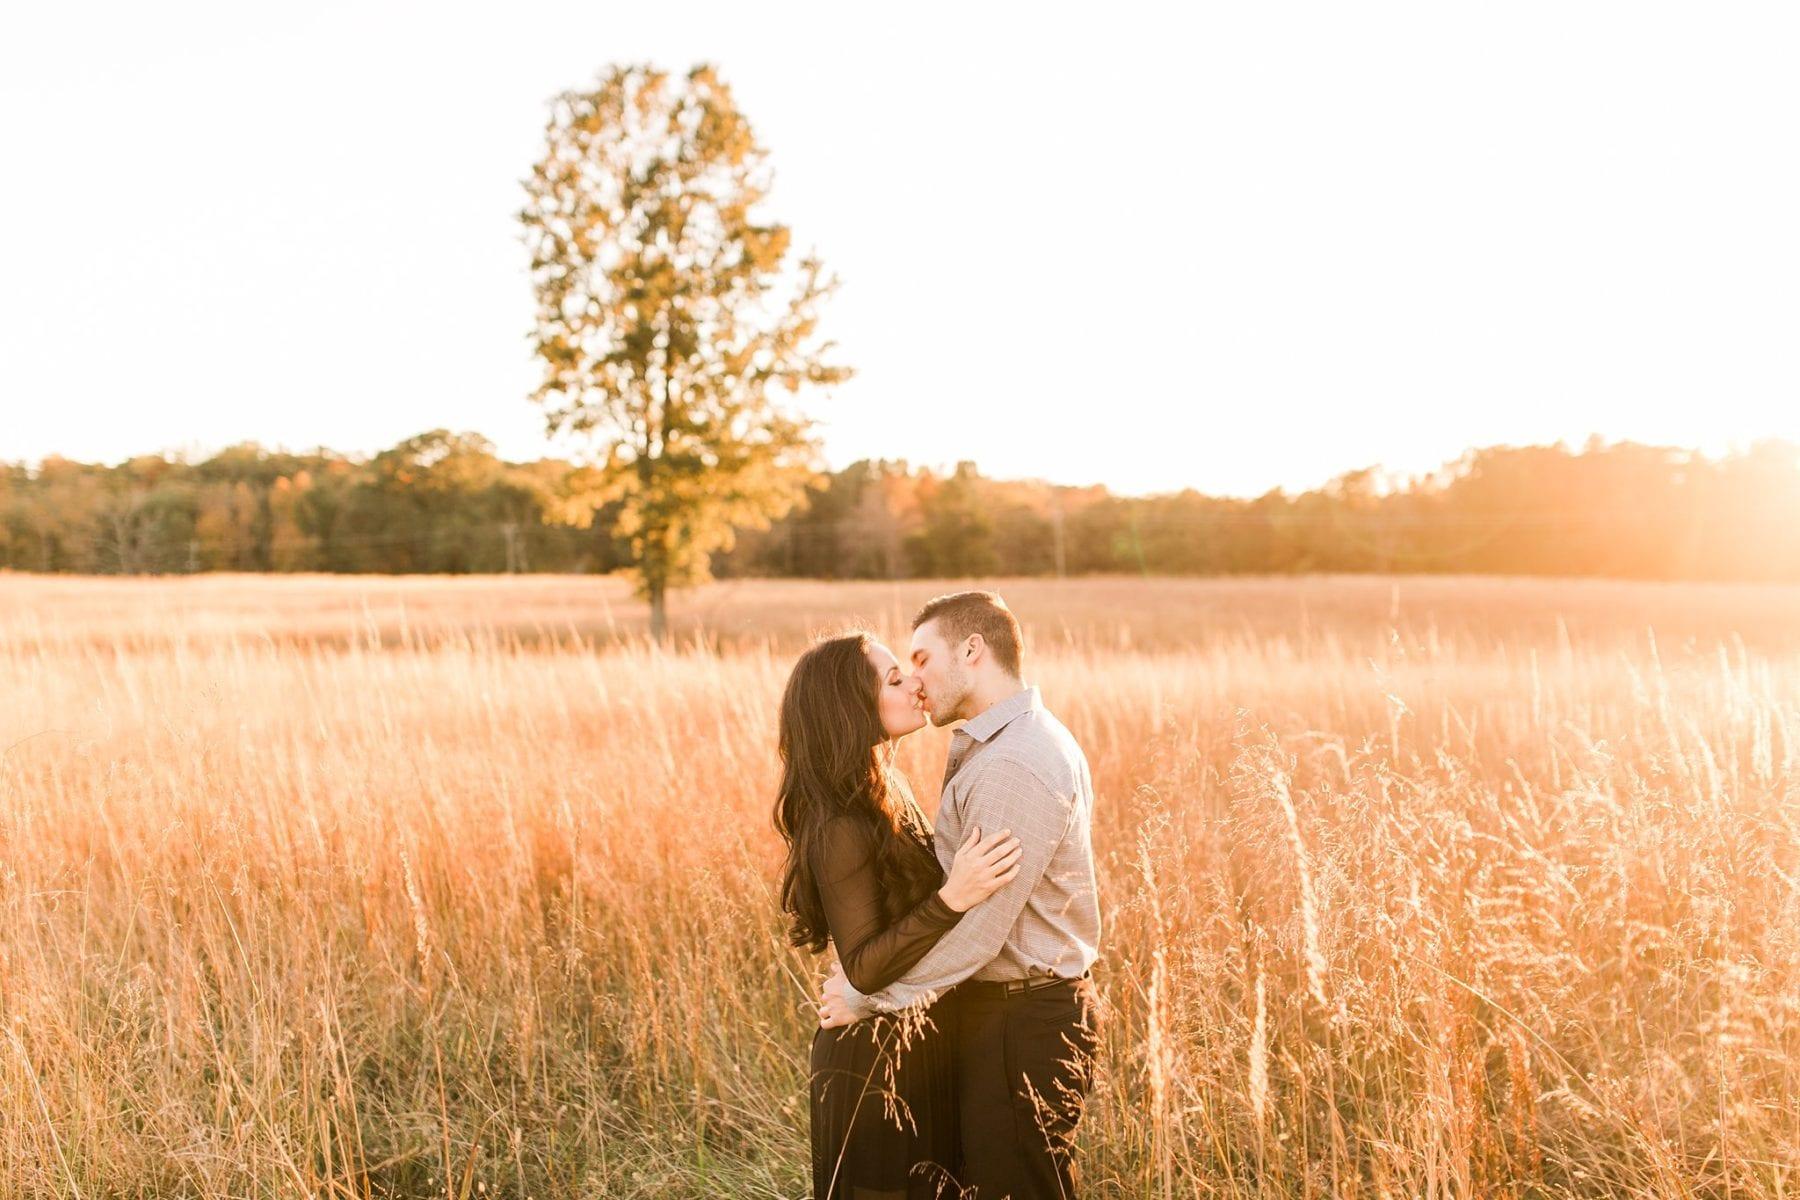 Manassas Battlefield Portraits Virginia Wedding Photographer Megan Kelsey Photography Lianne & Chris-246.jpg